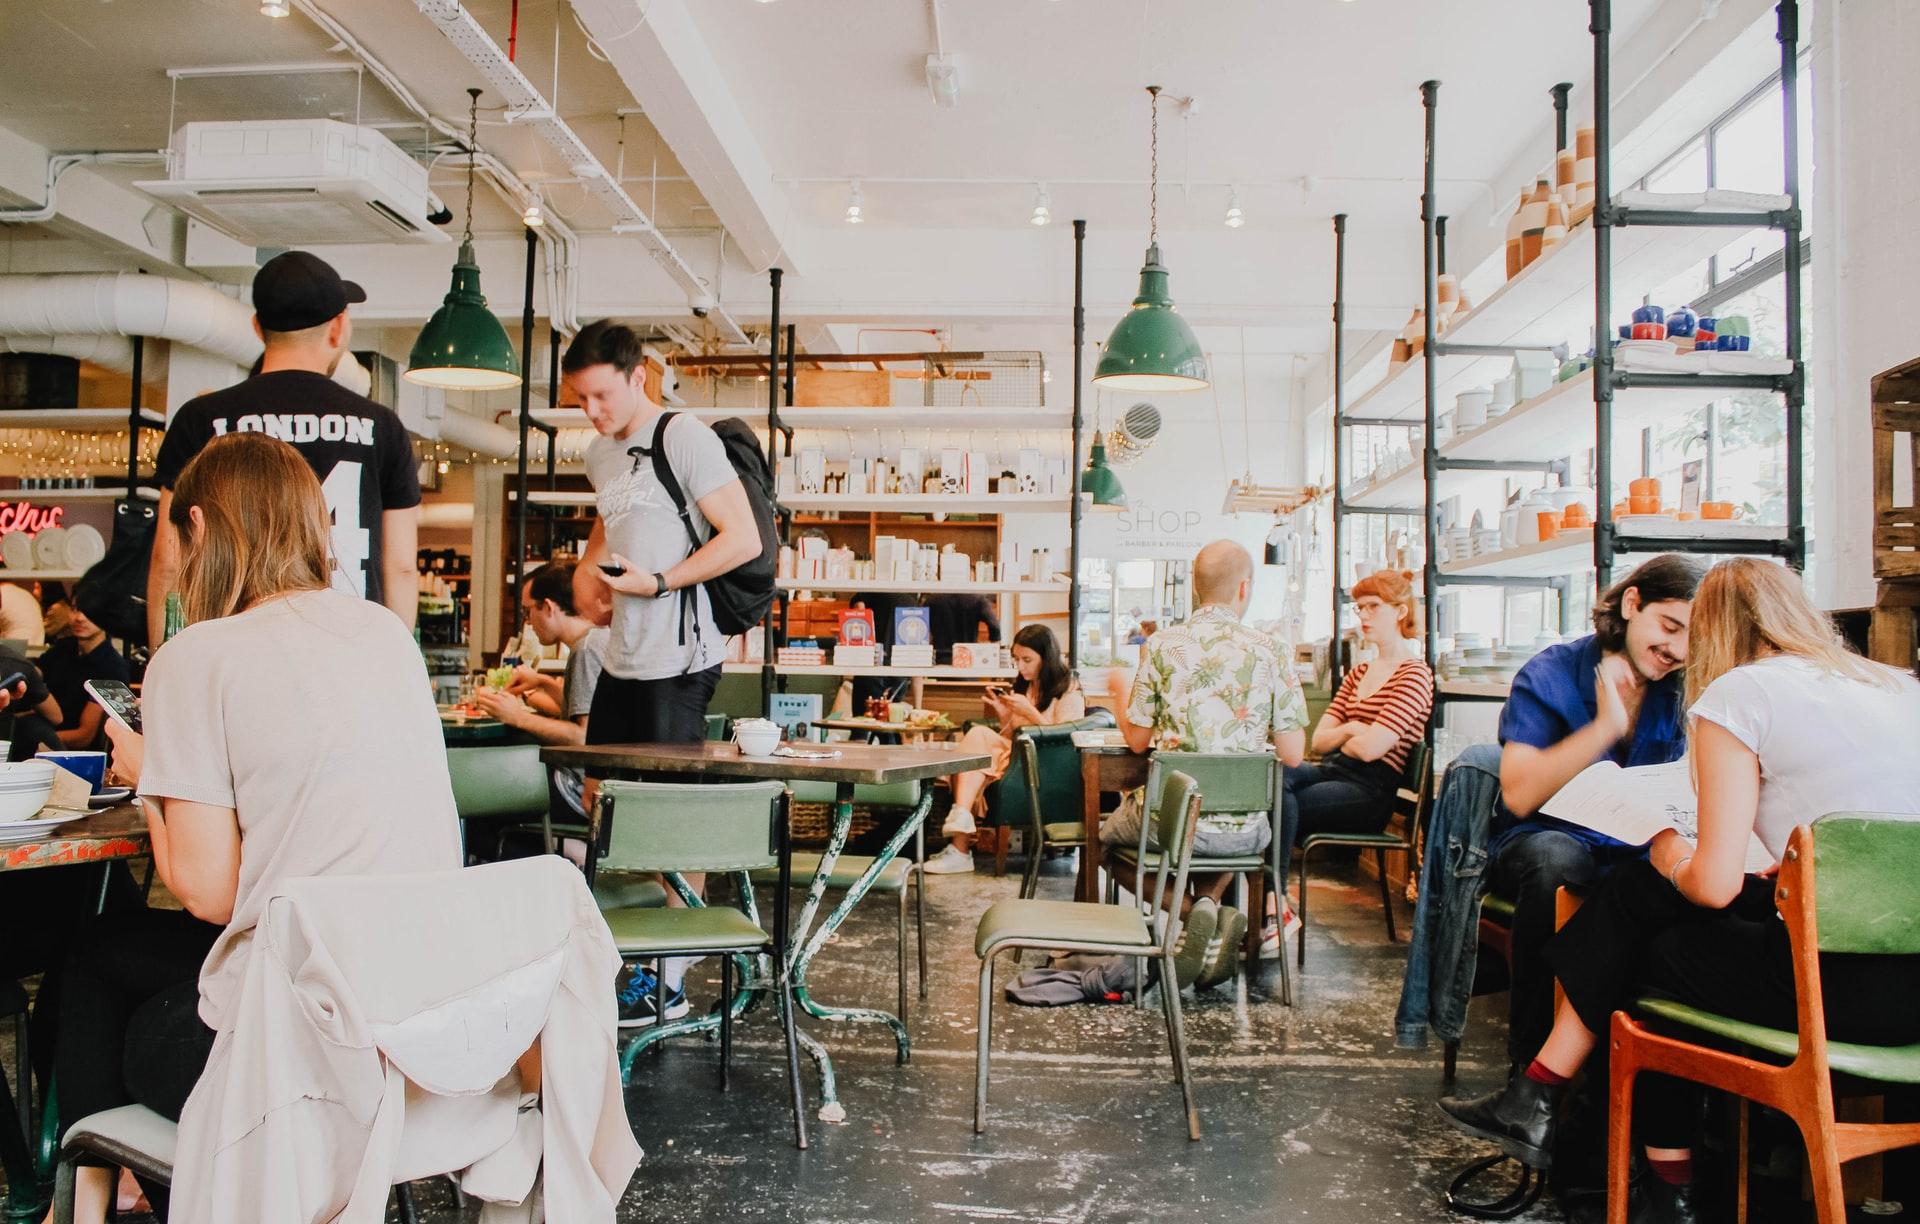 people inside a cafe